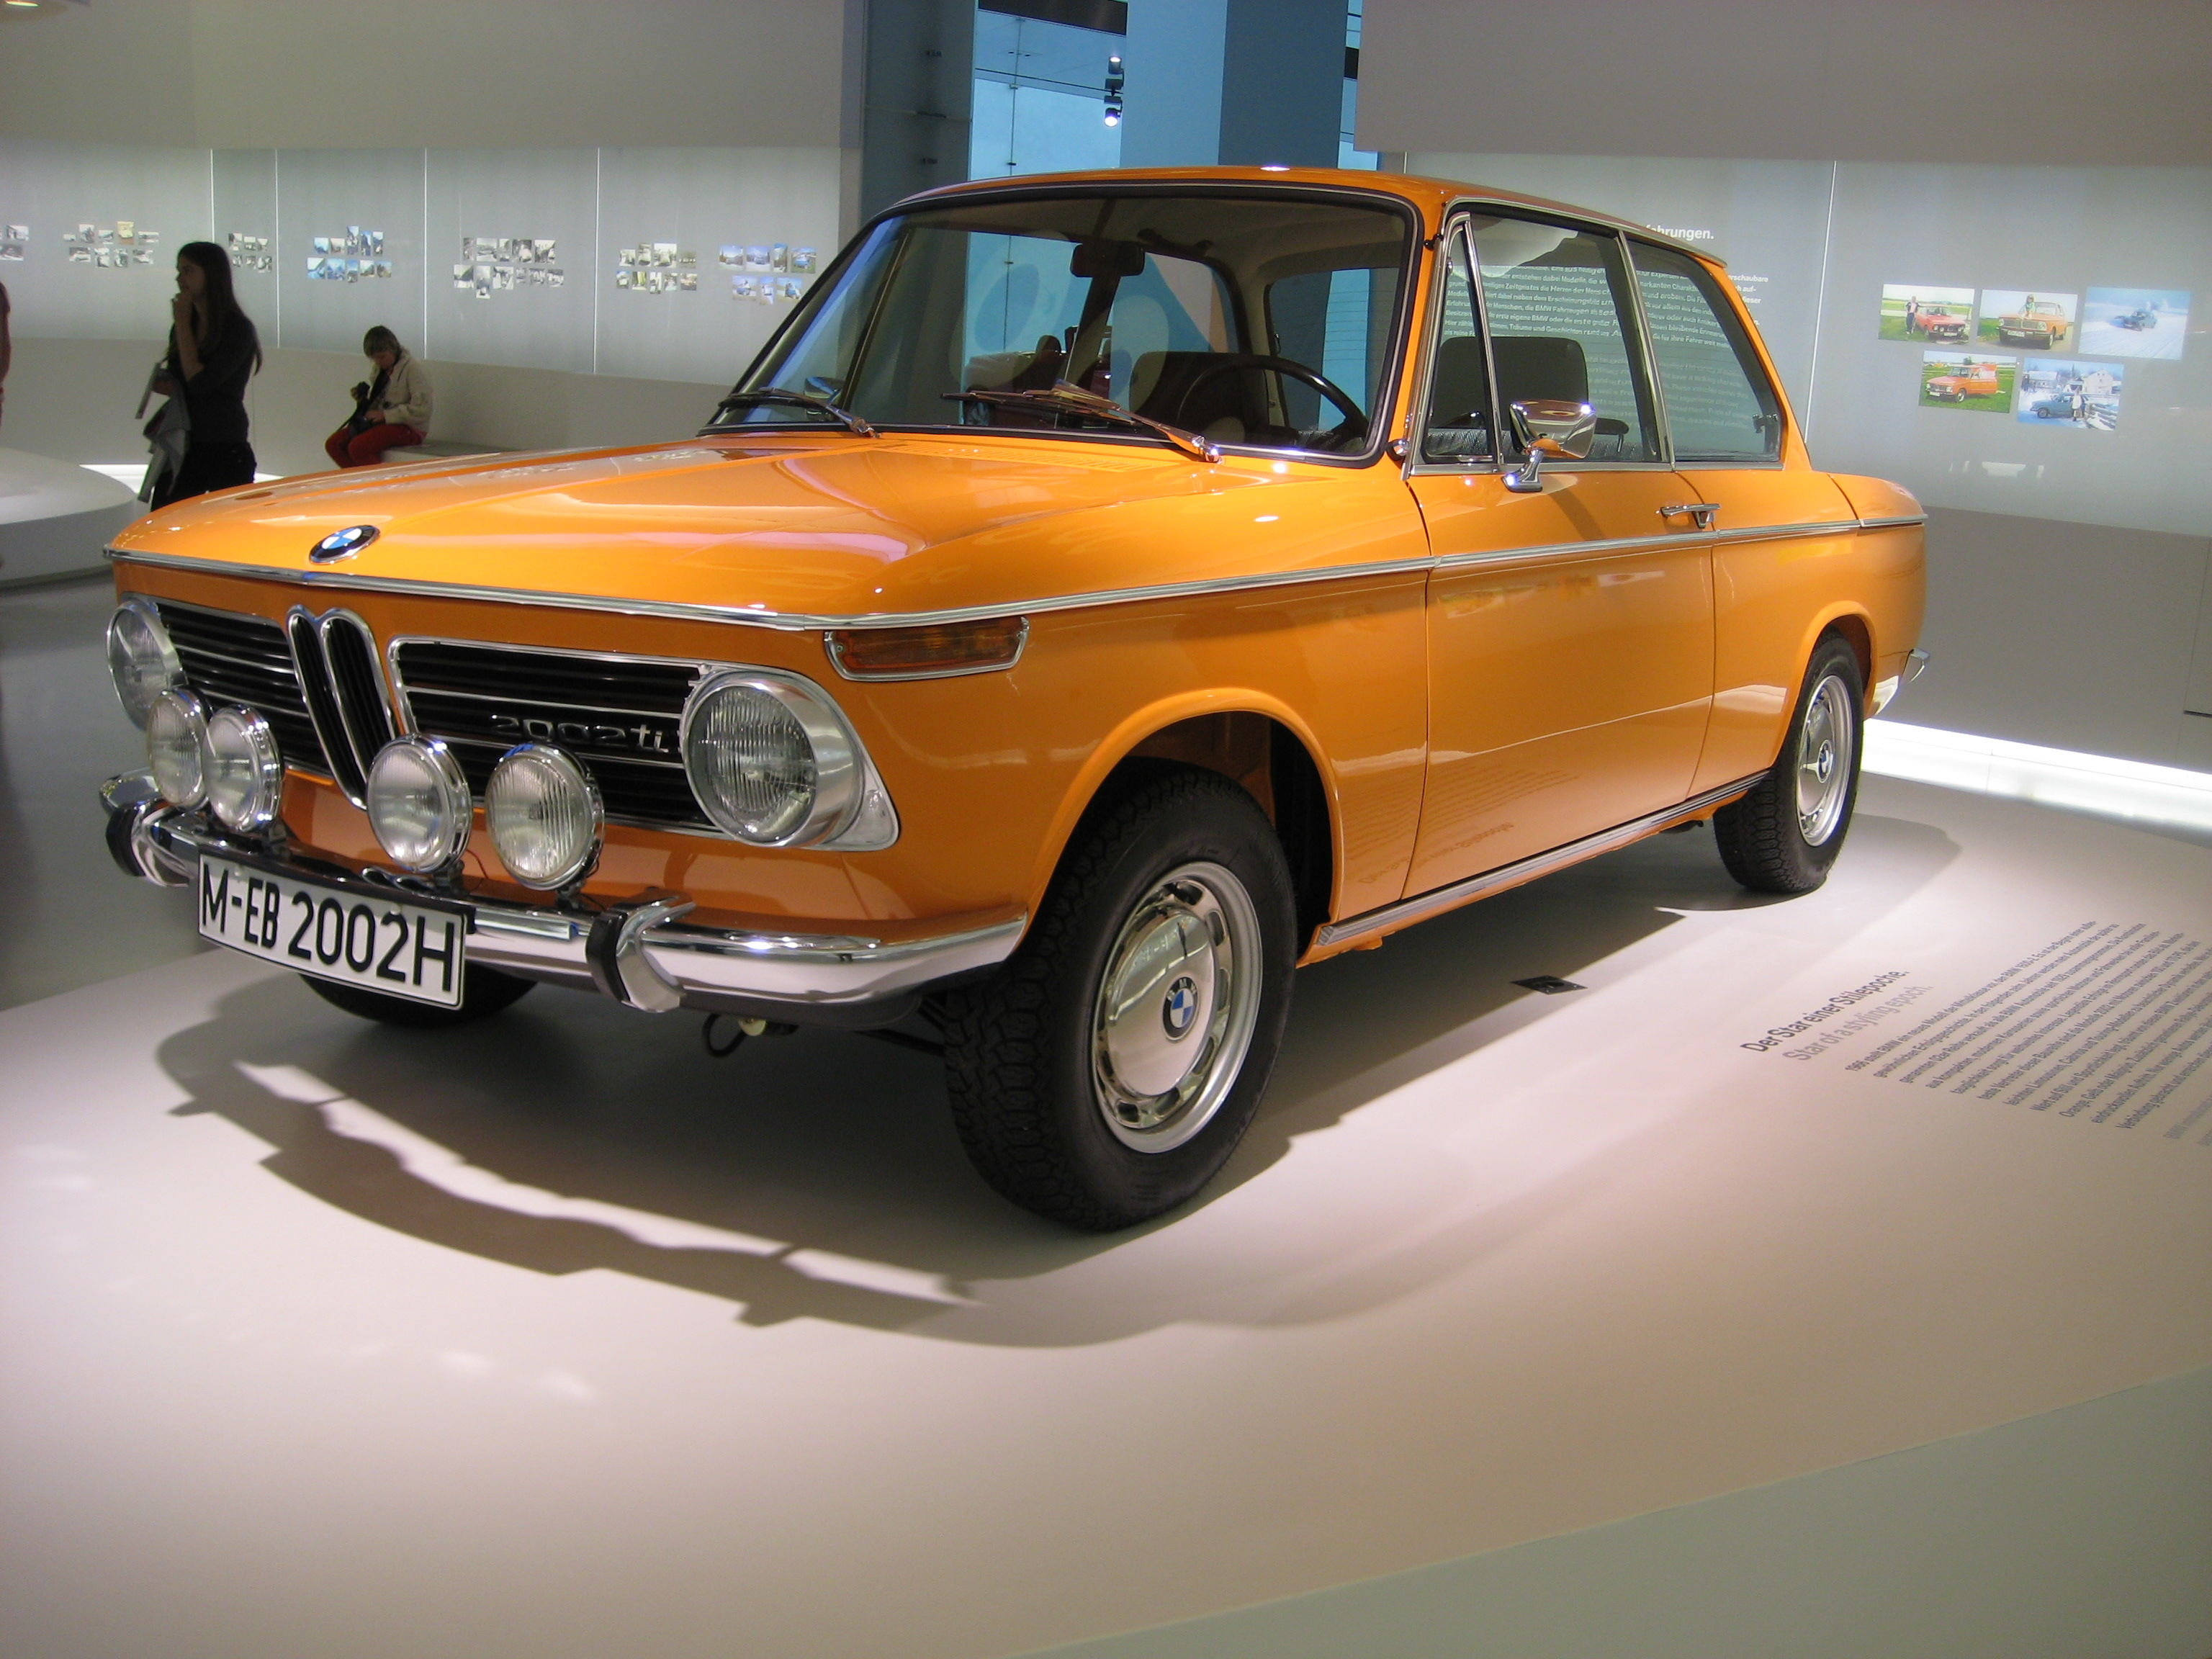 File:BMW 2002 ti.JPG - Wikimedia Commons